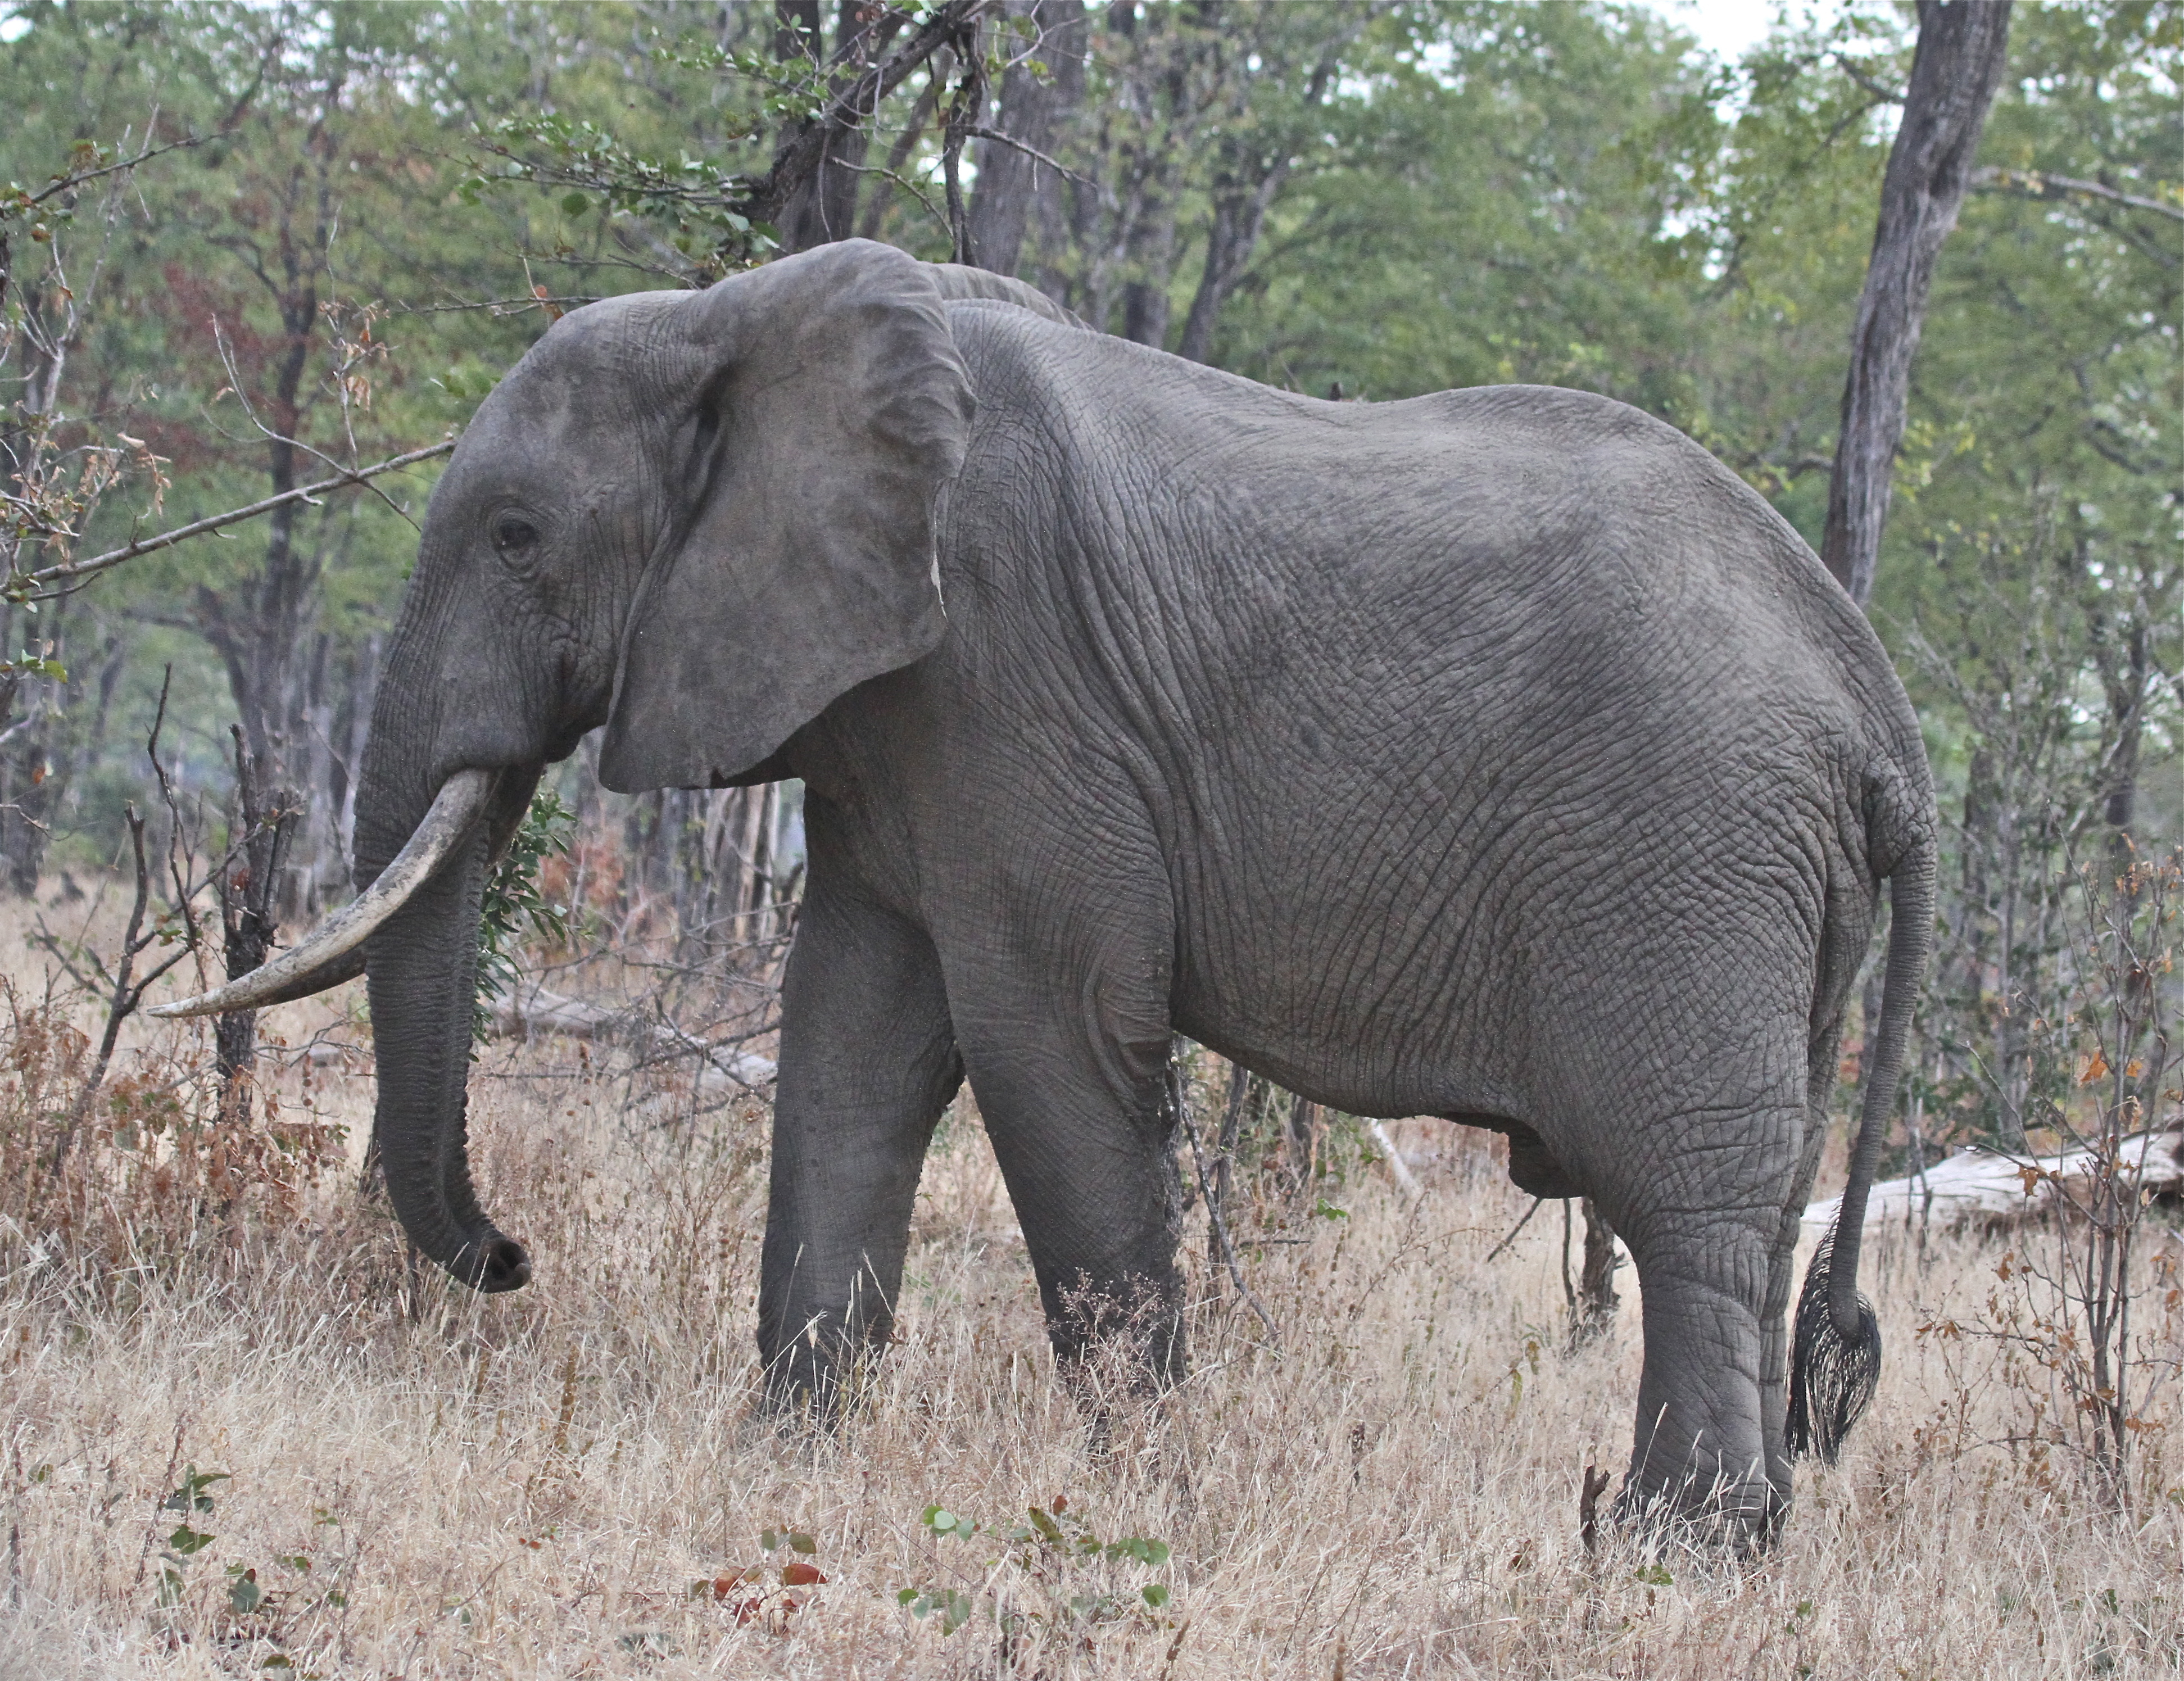 A heavy-footed elephant